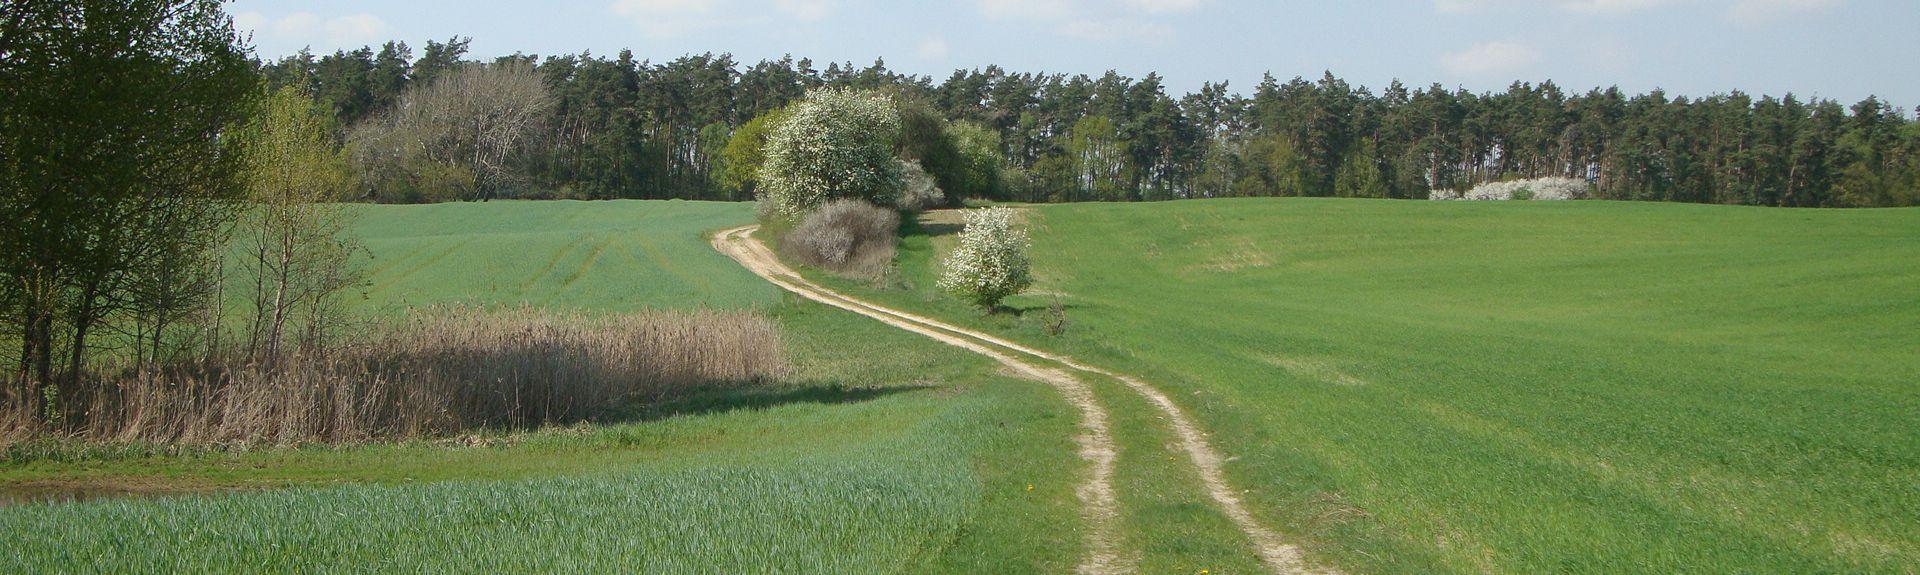 Herzfelde, Templin, Brandenburg Region, Germany